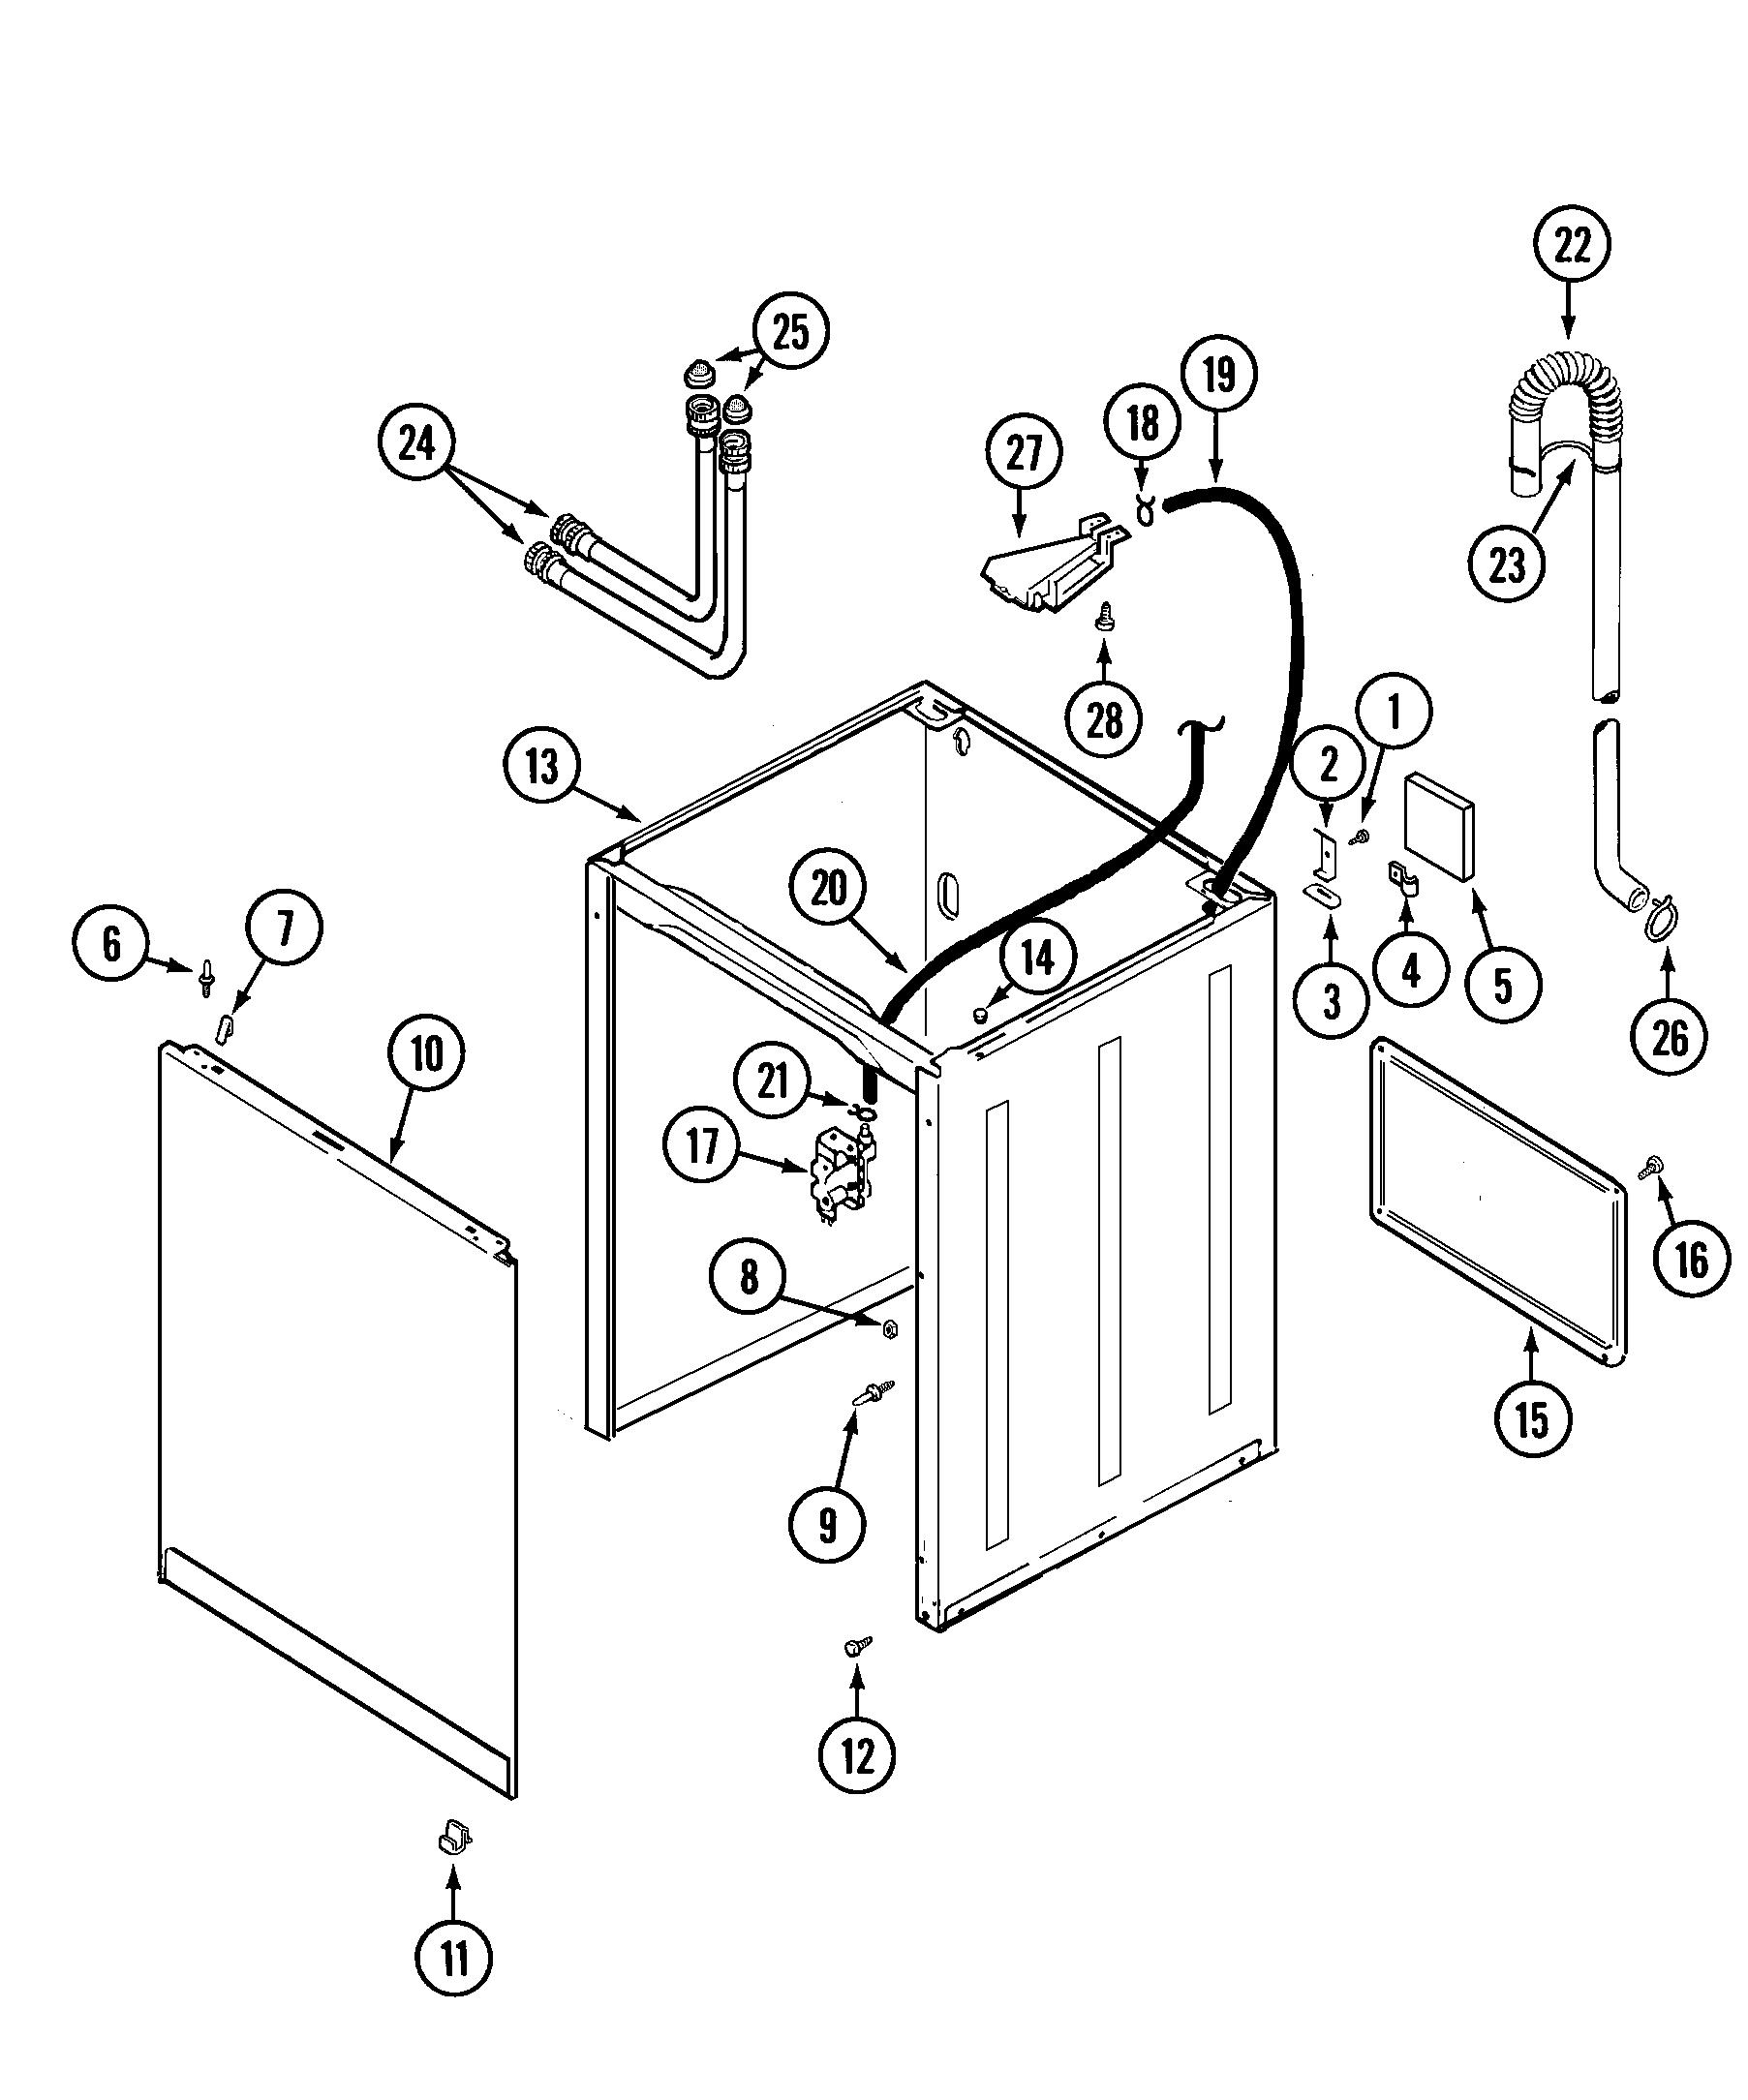 hight resolution of wiring information maytag pav2200aww cabinet diagram